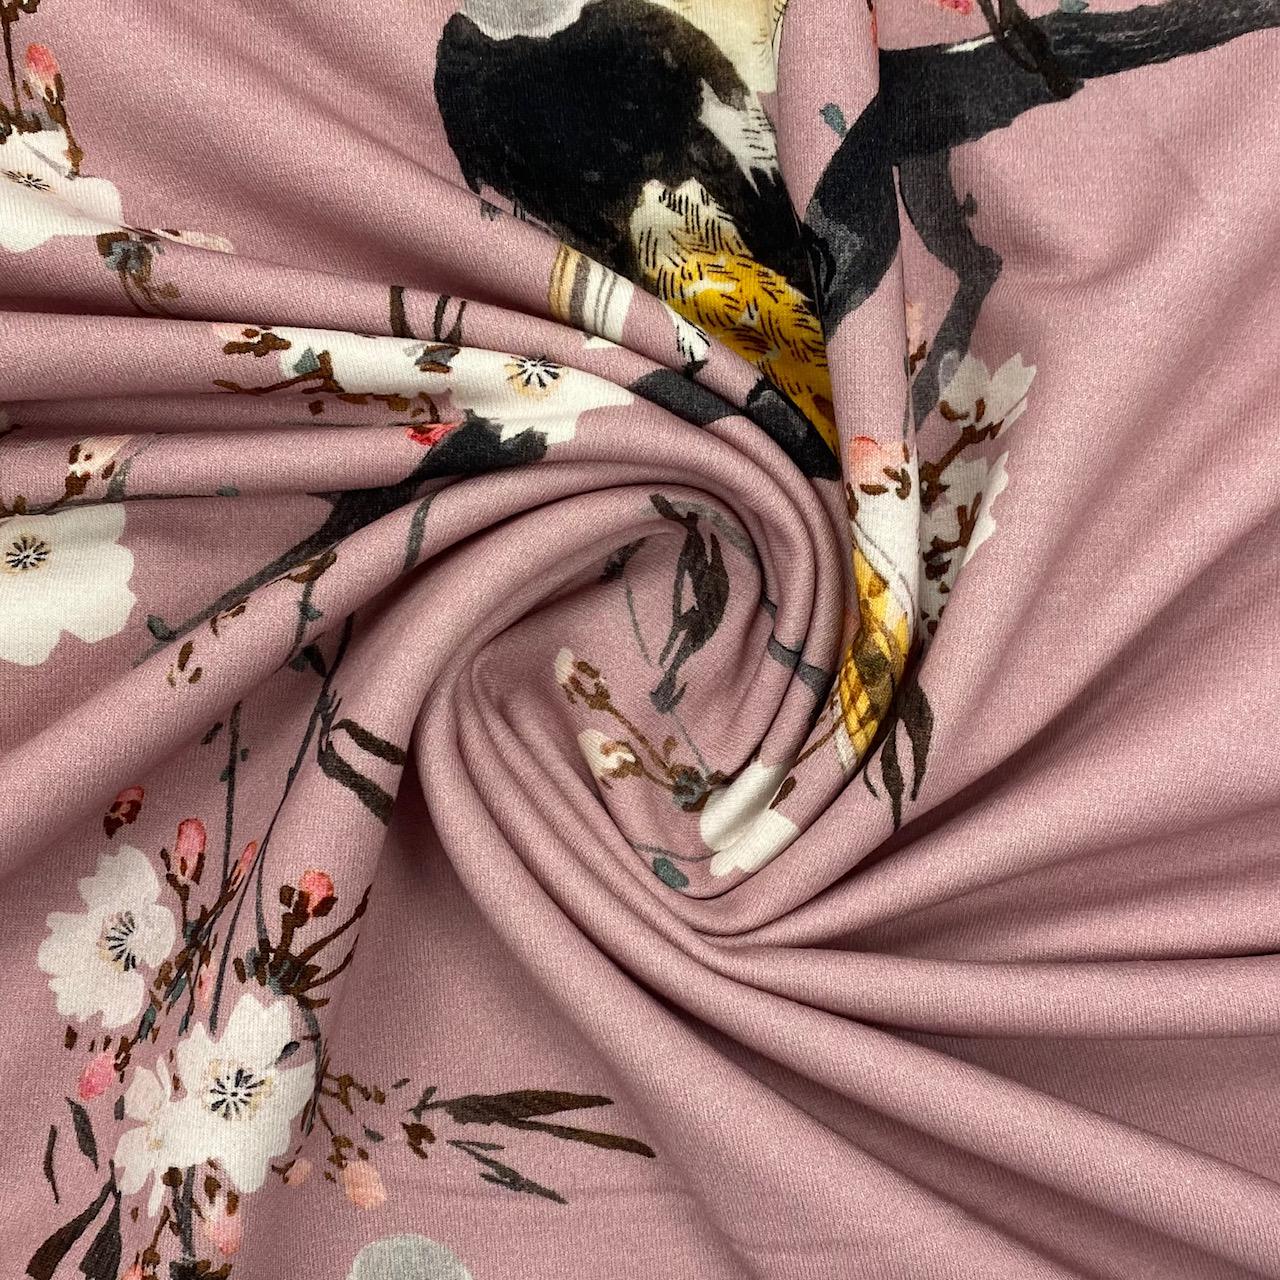 Sweat French Terry, angeraut, Wintervogel, rosa.  Art. 924640.11